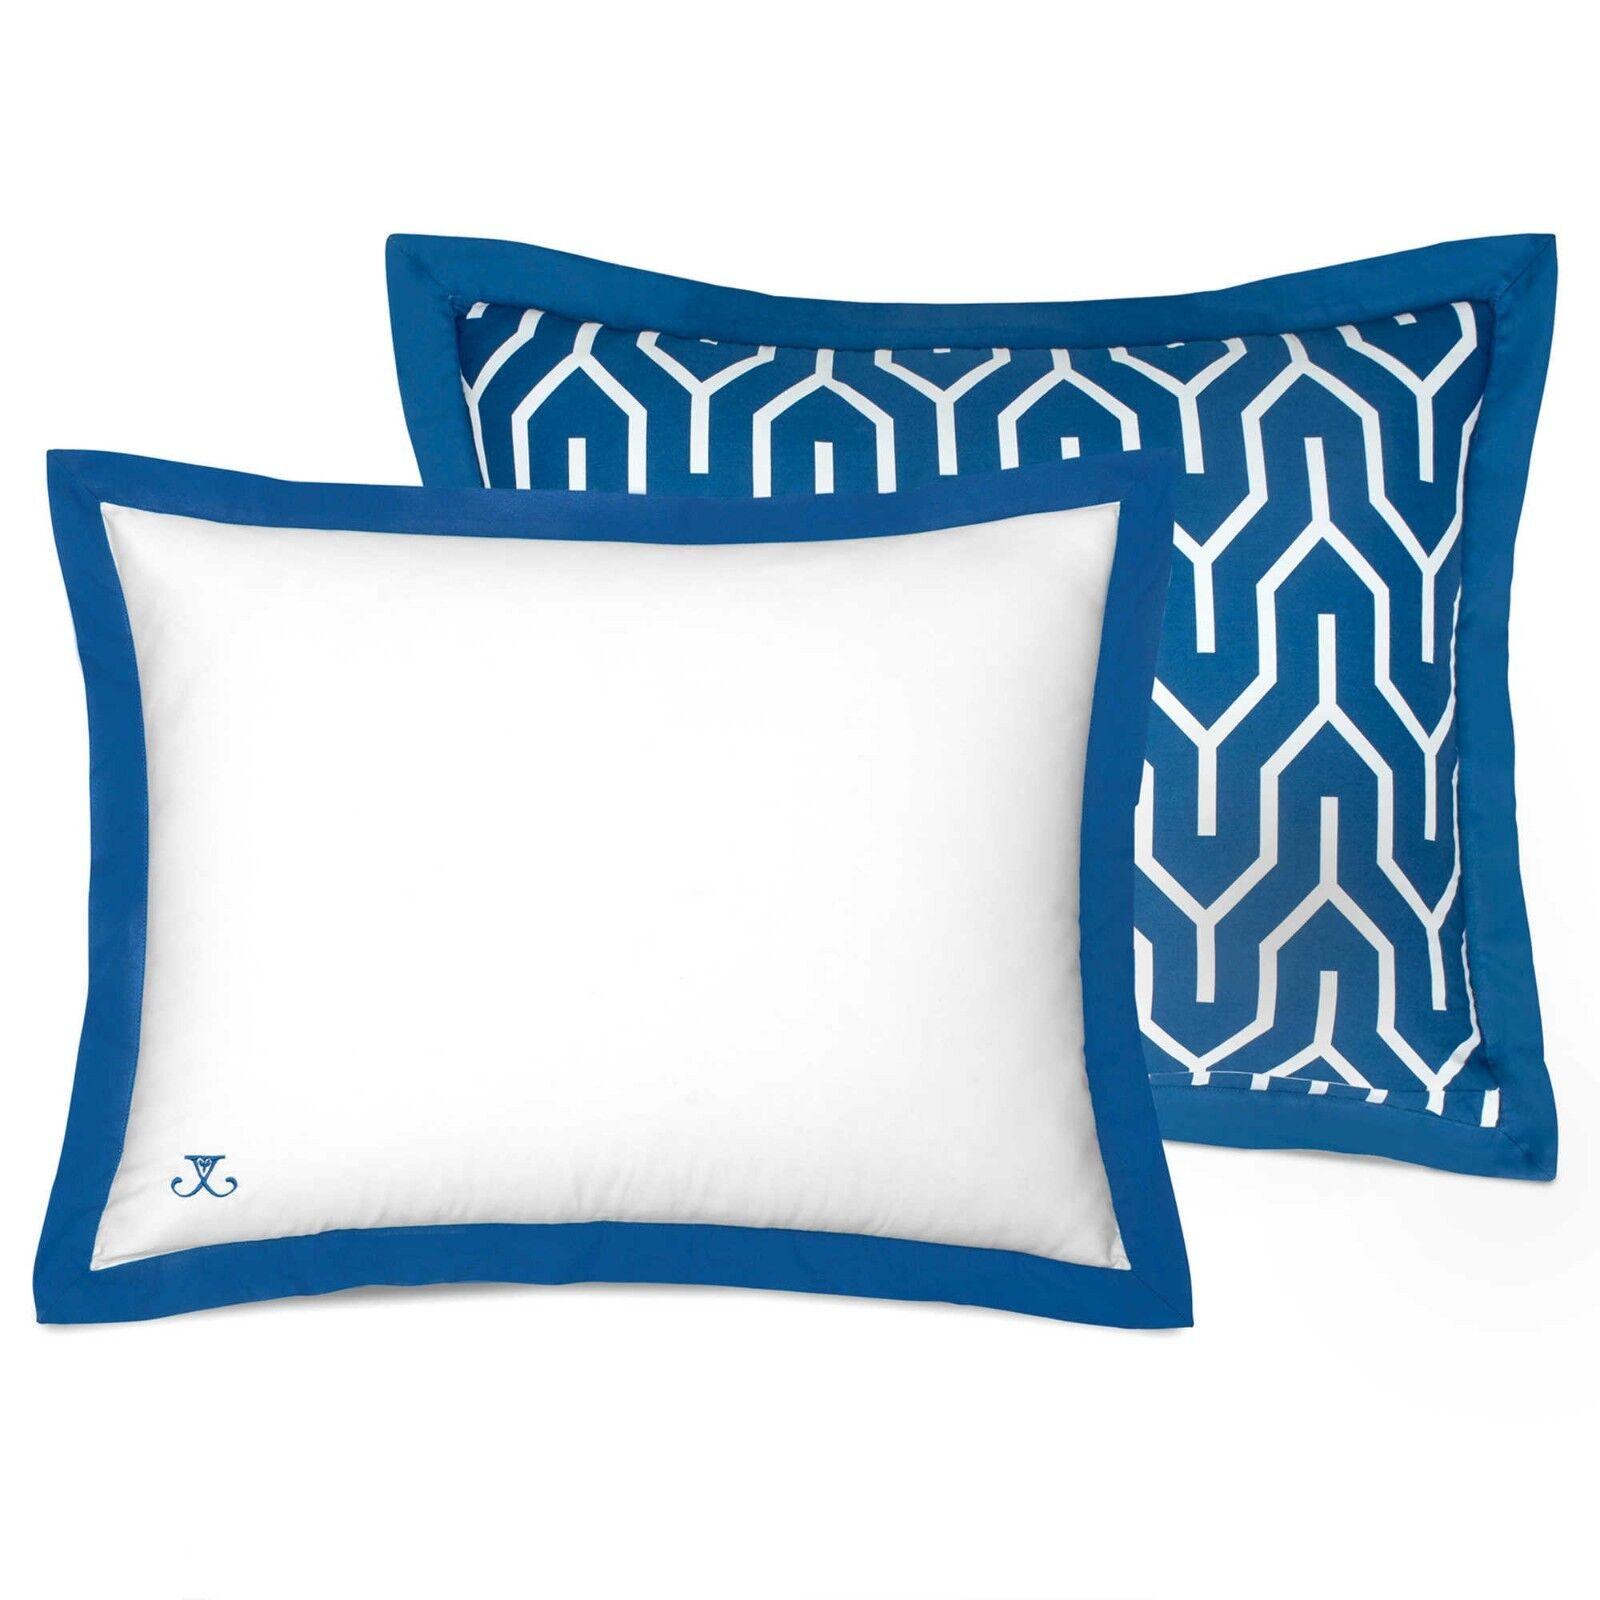 JILL pinkNWALD Standard Pillow Sham PLIMPTON FLAME Reversible, blueeee & White, NEW